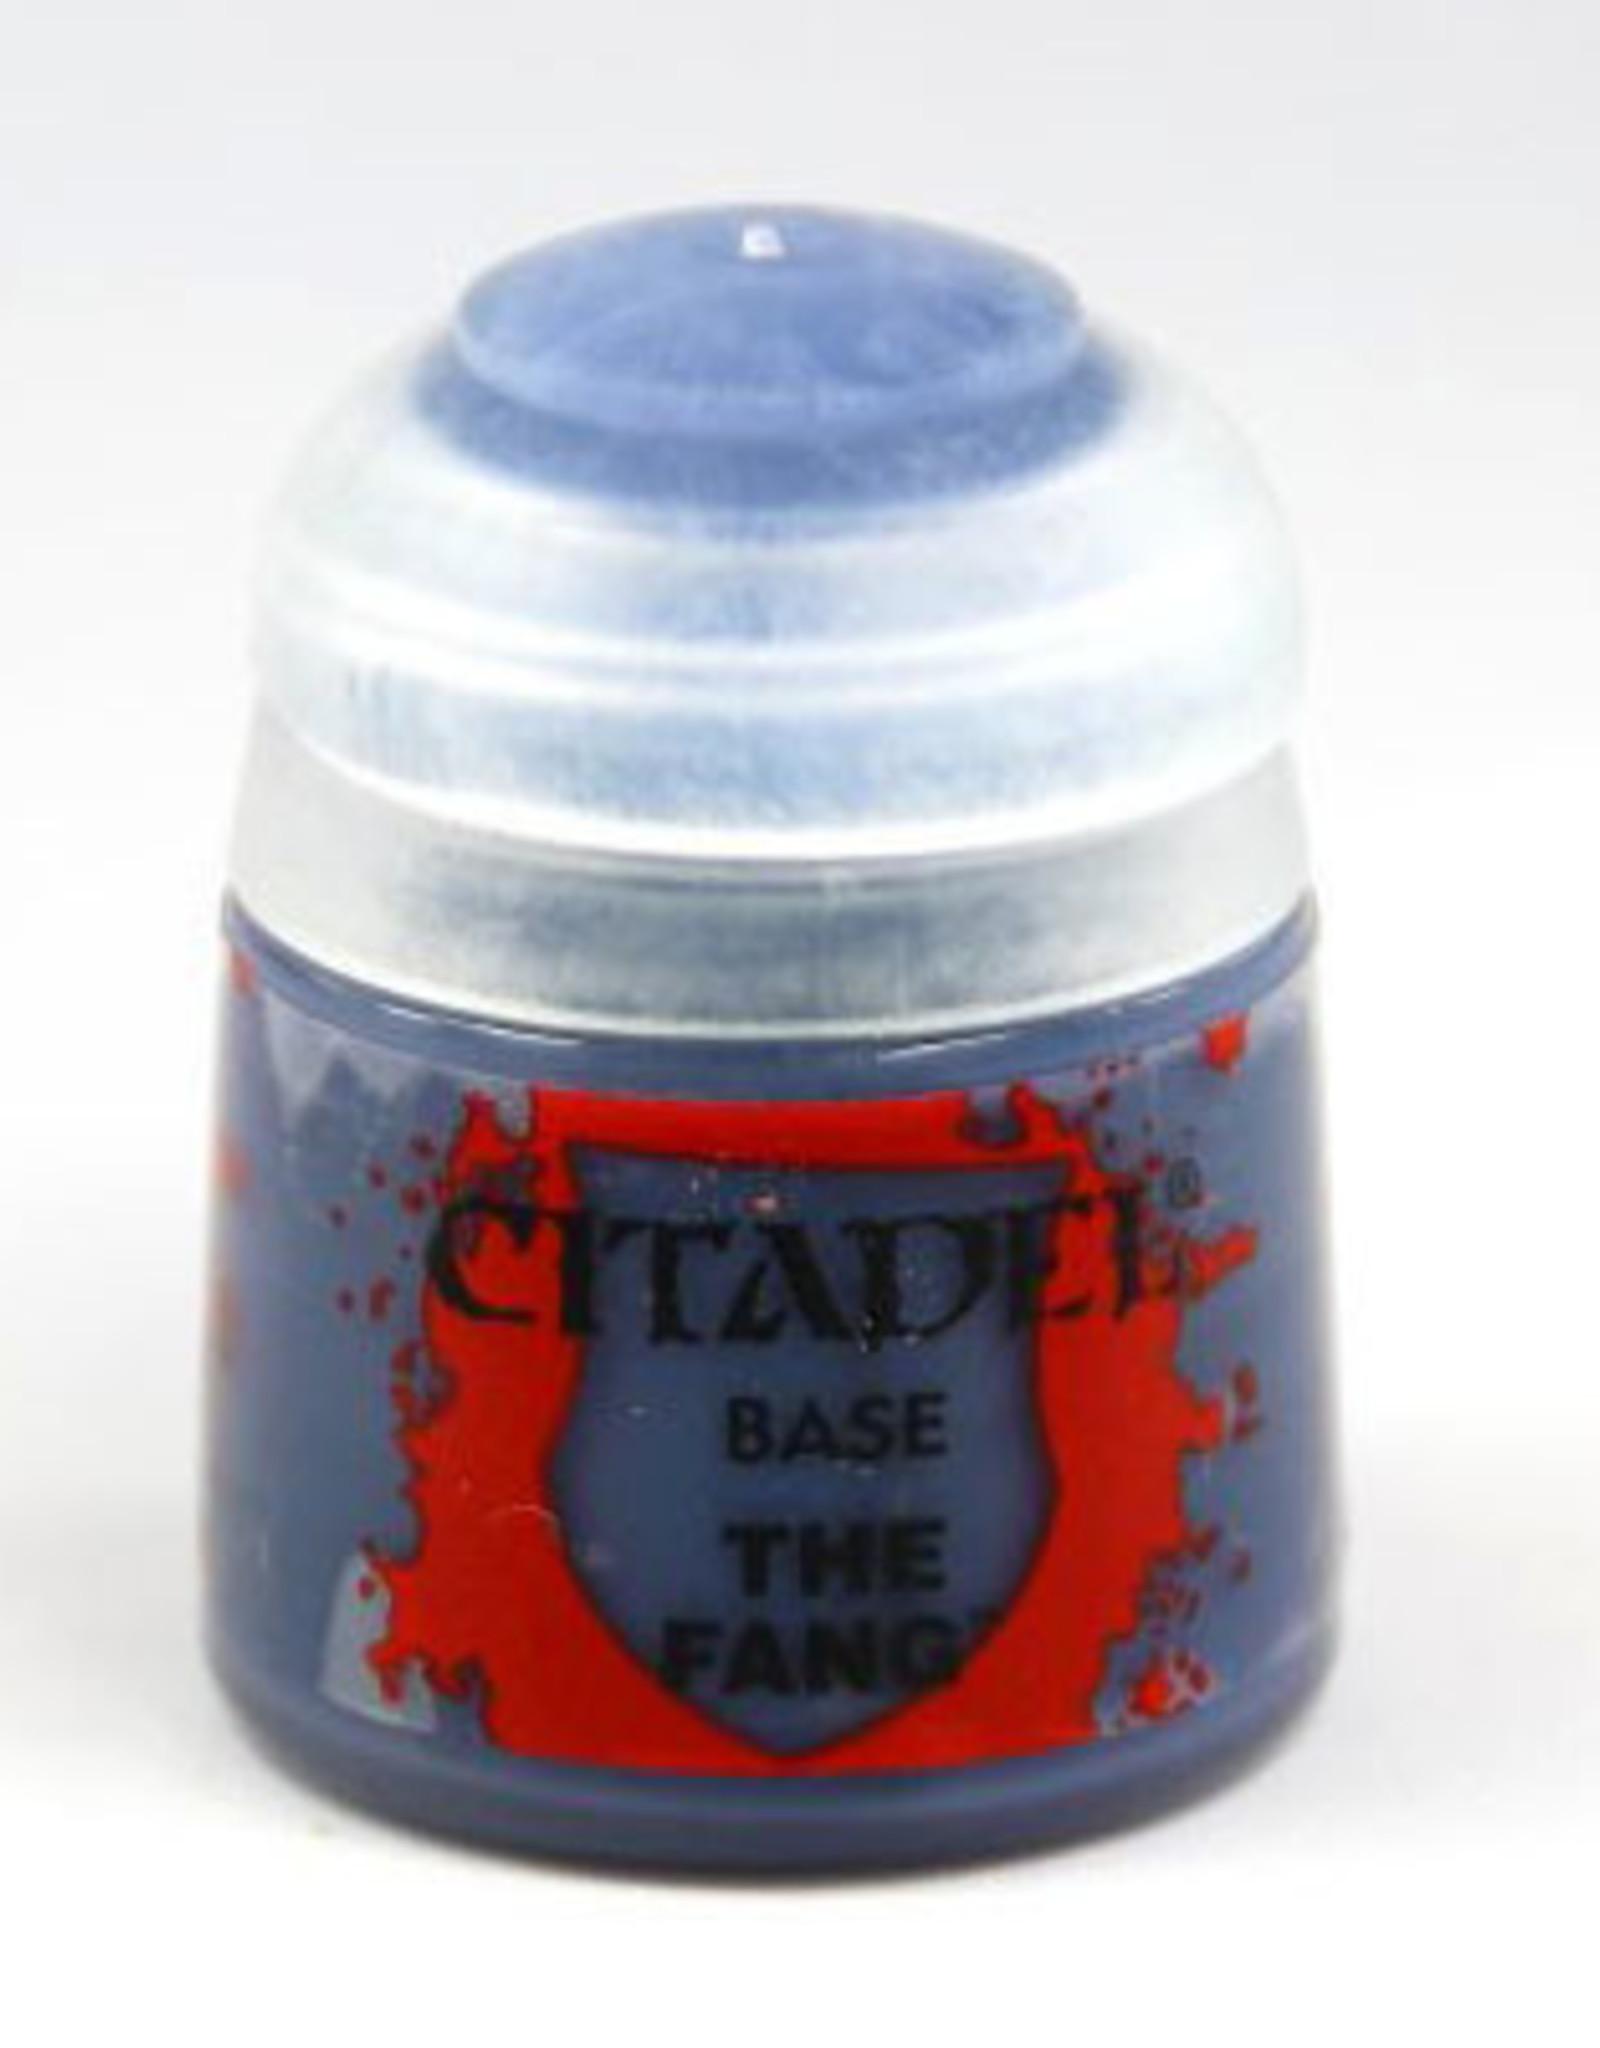 Games Workshop Citadel Paint: Base - The Fang